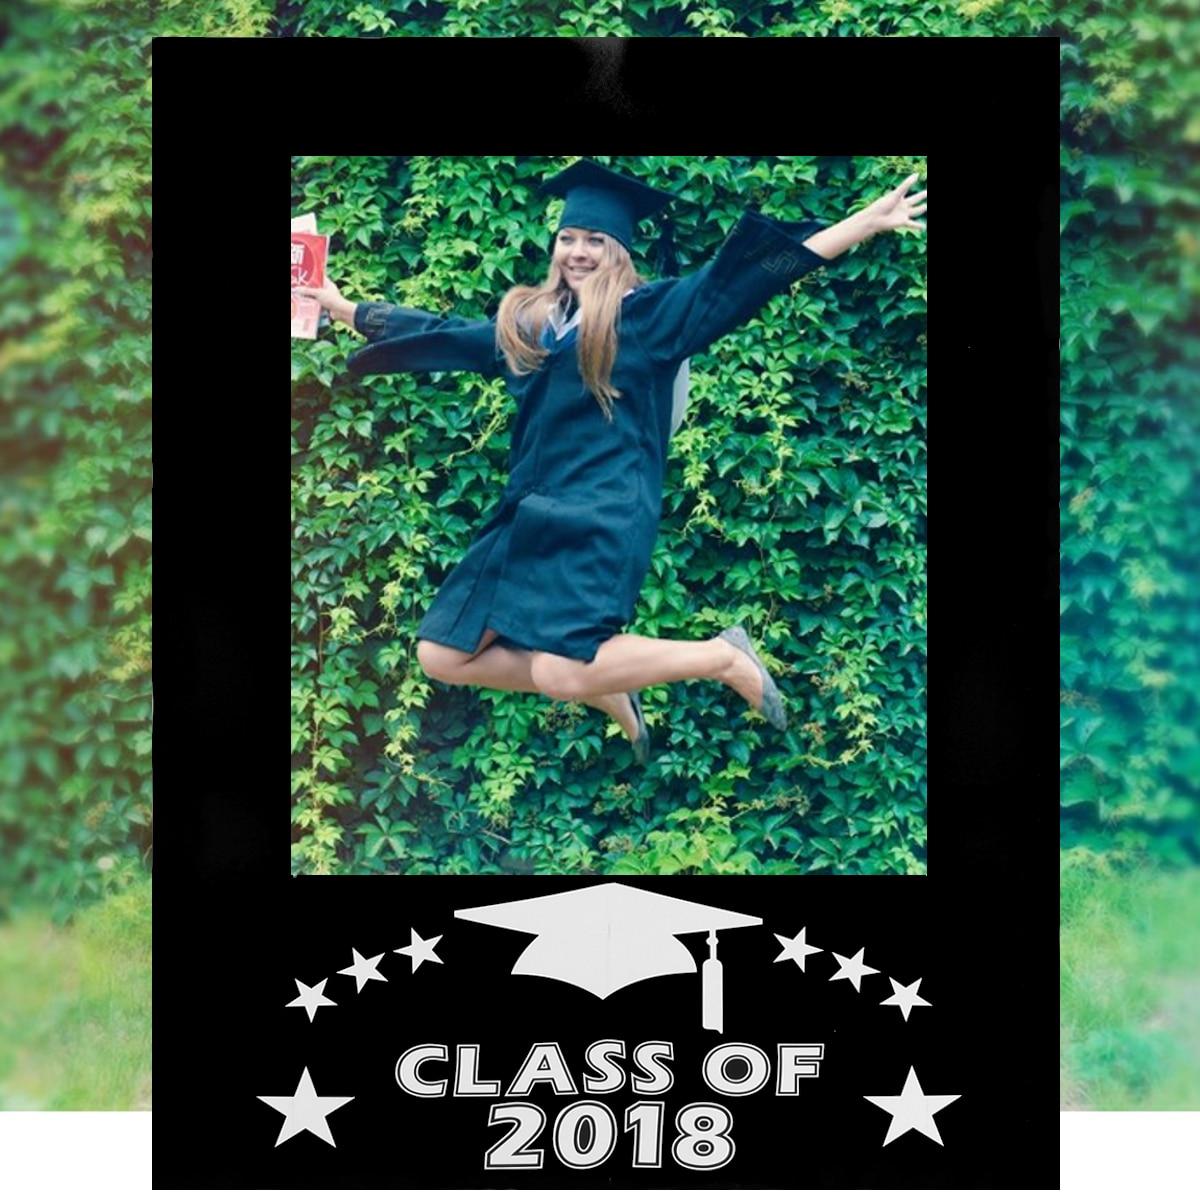 Class Of 2018 Graduation Party Props Decoration DIY Photo Picture ...